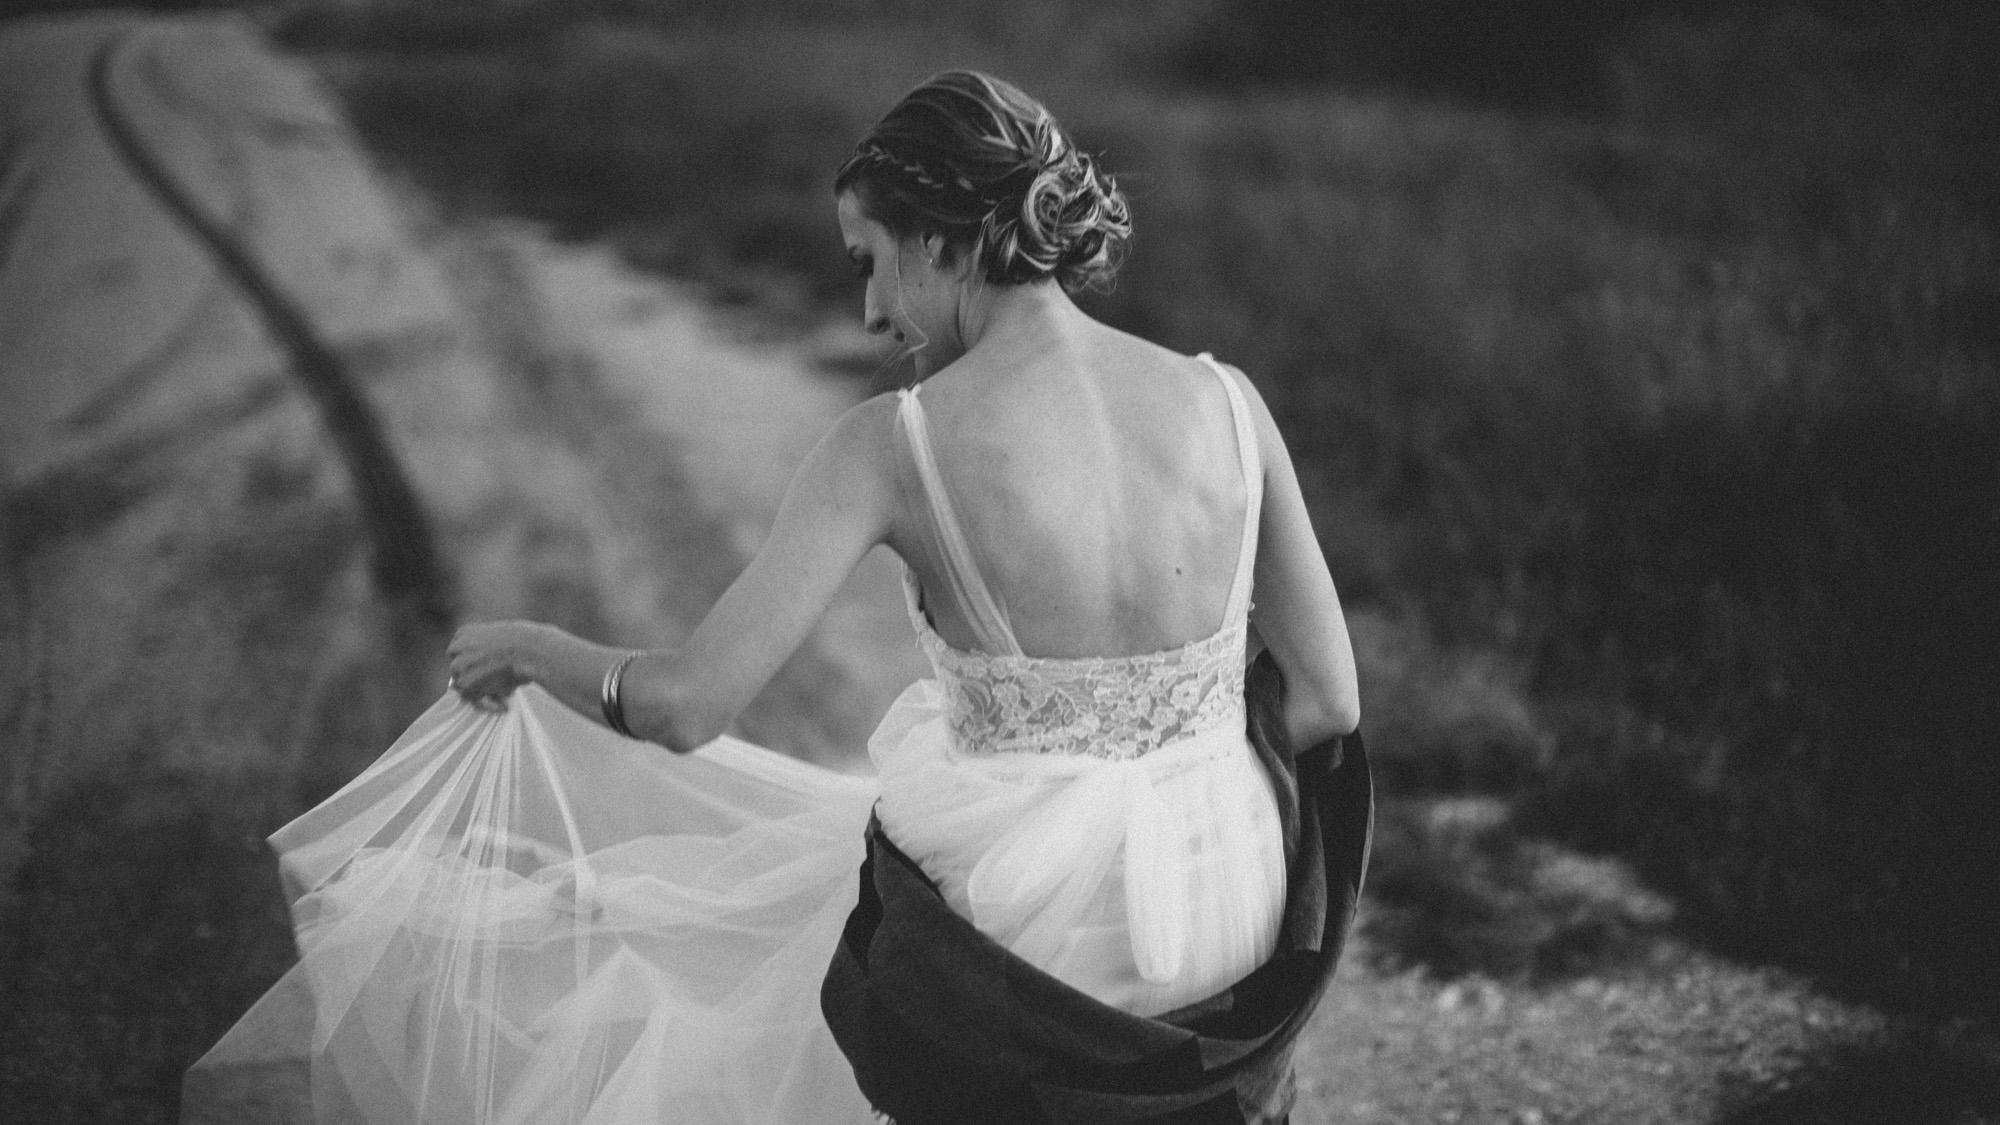 alec_vanderboom_springfield_missouri_wedding-0072.jpg